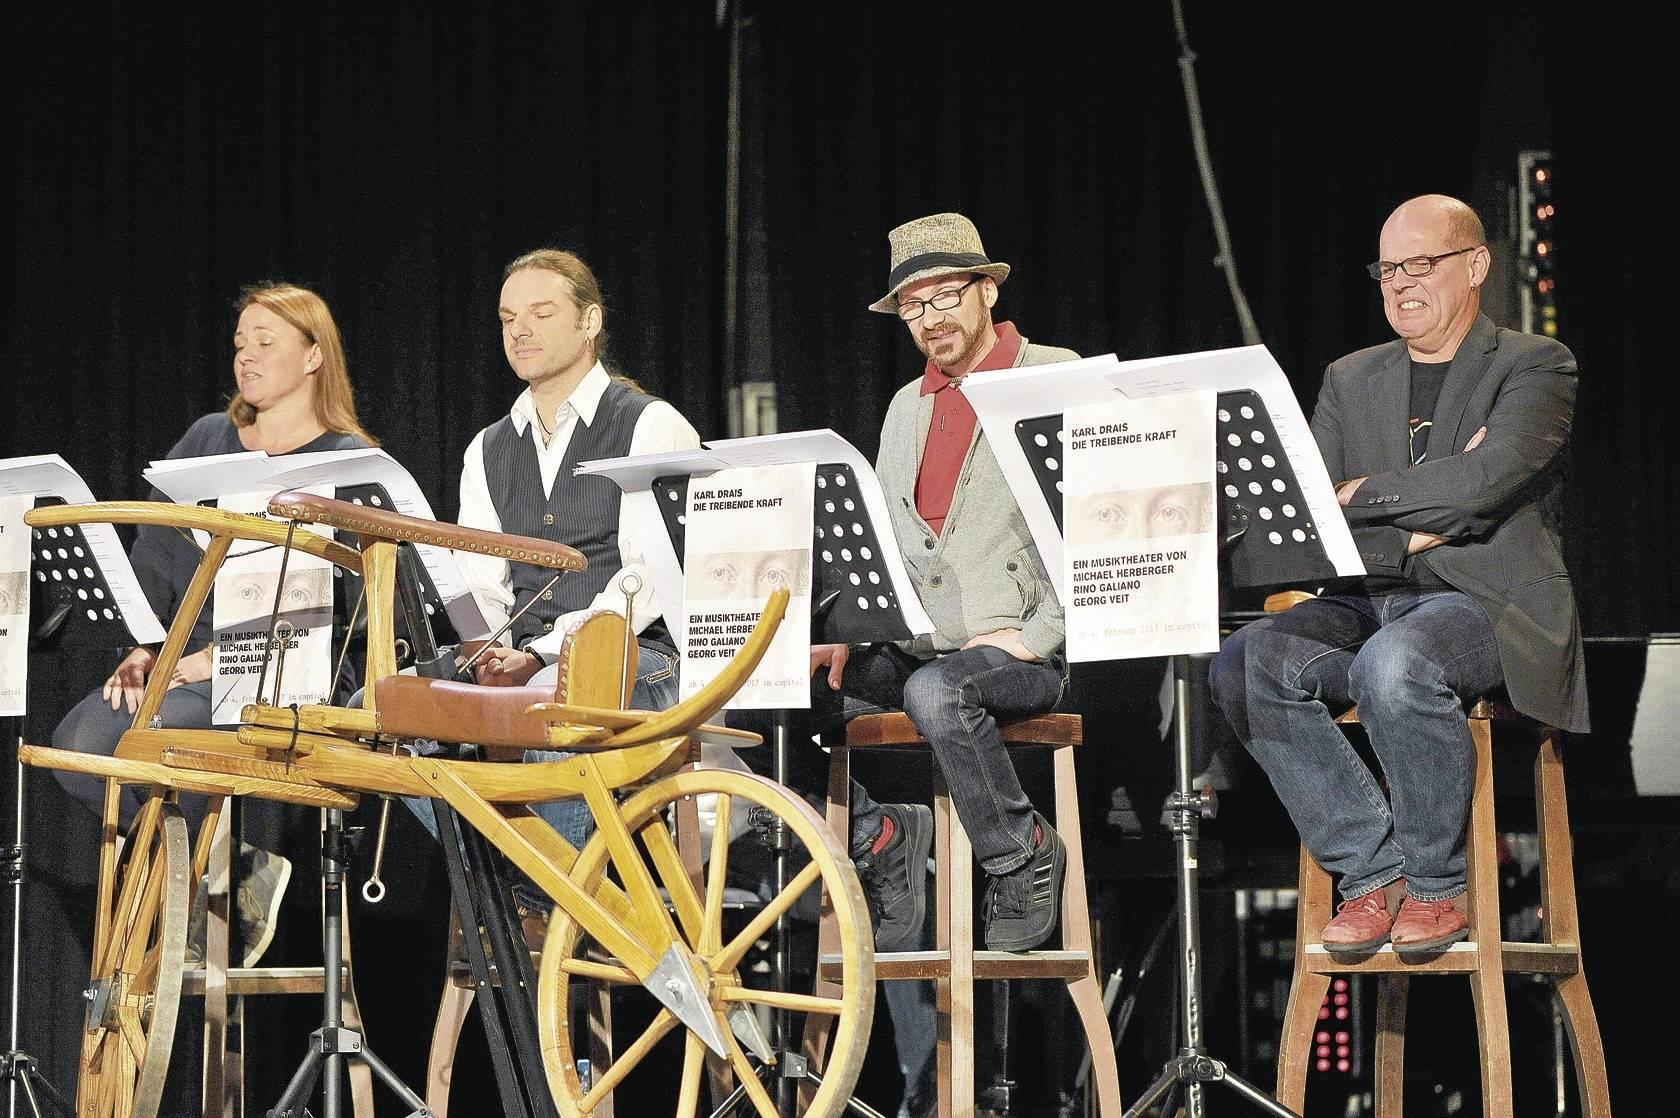 Capitol präsentiert Karl-Drais-Musical zum Fahrradjubiläum 2017 ...